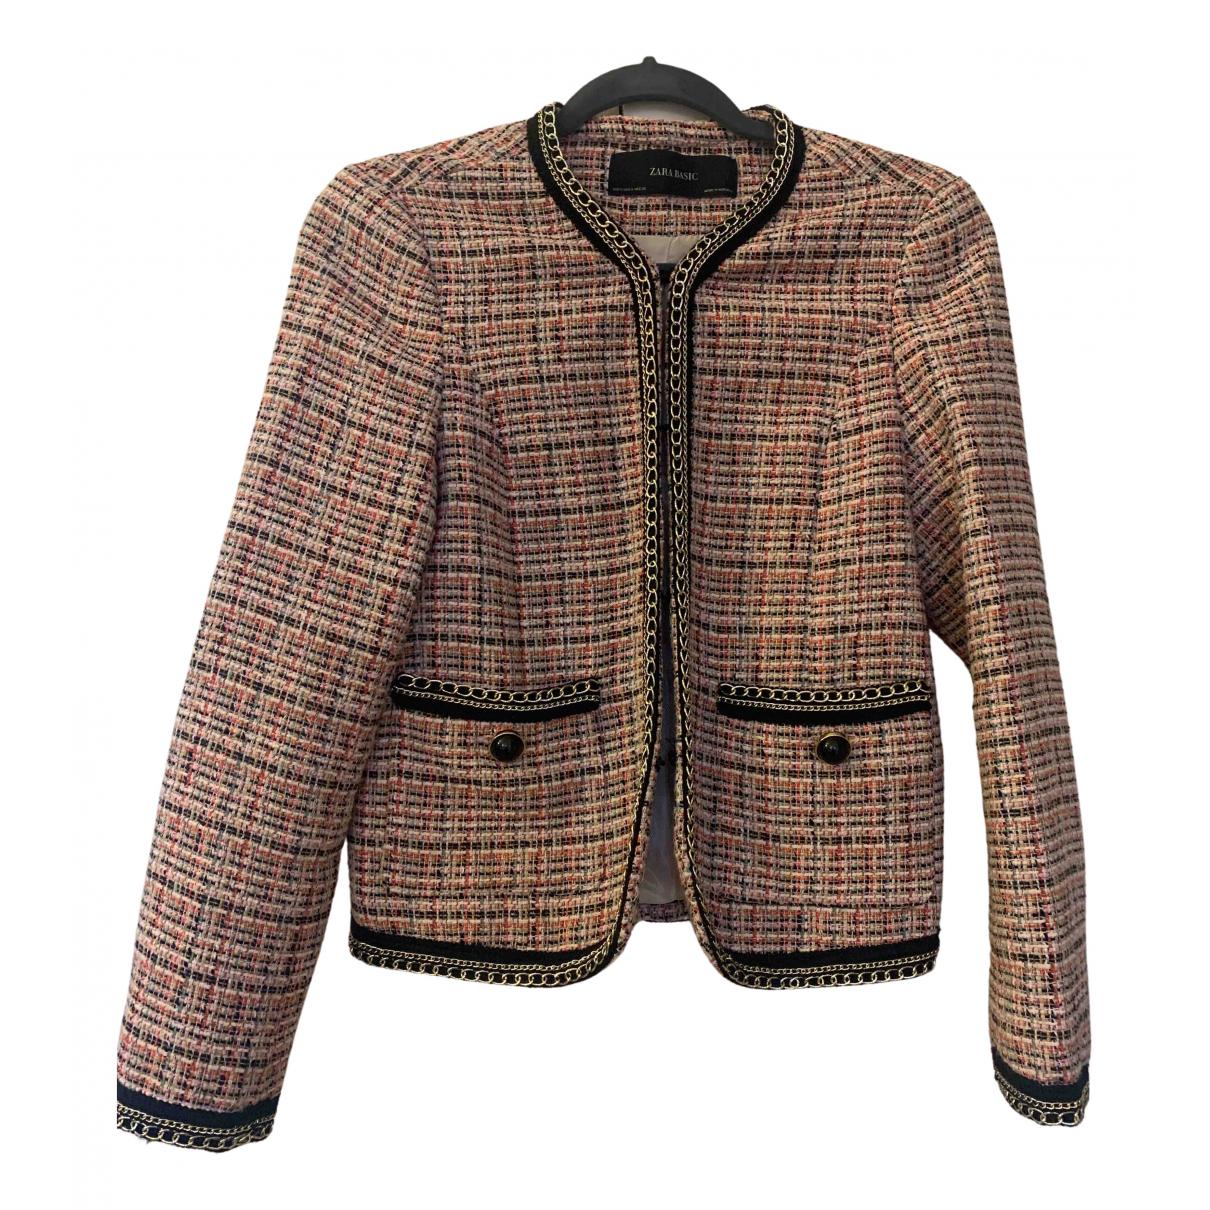 Zara N Multicolour Tweed jacket for Women S International